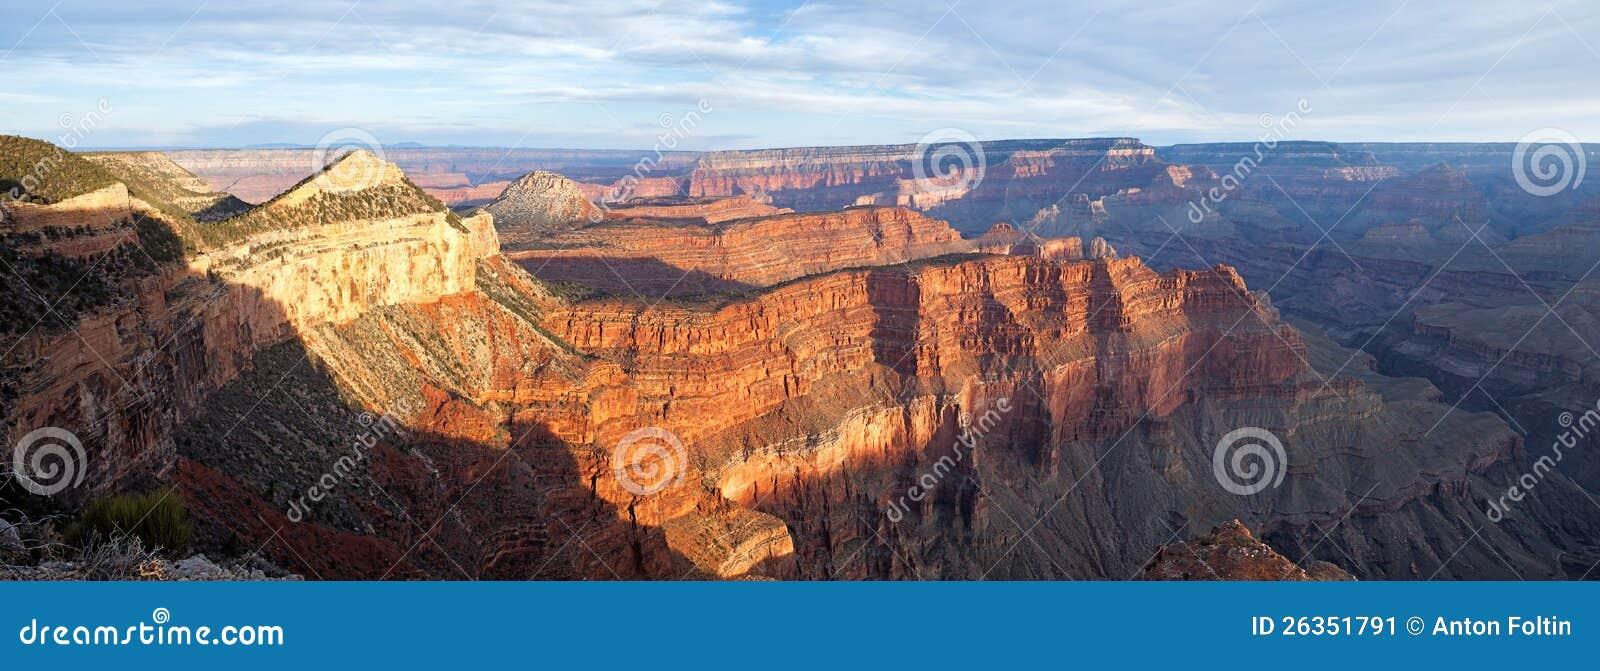 Versteinerter Berg